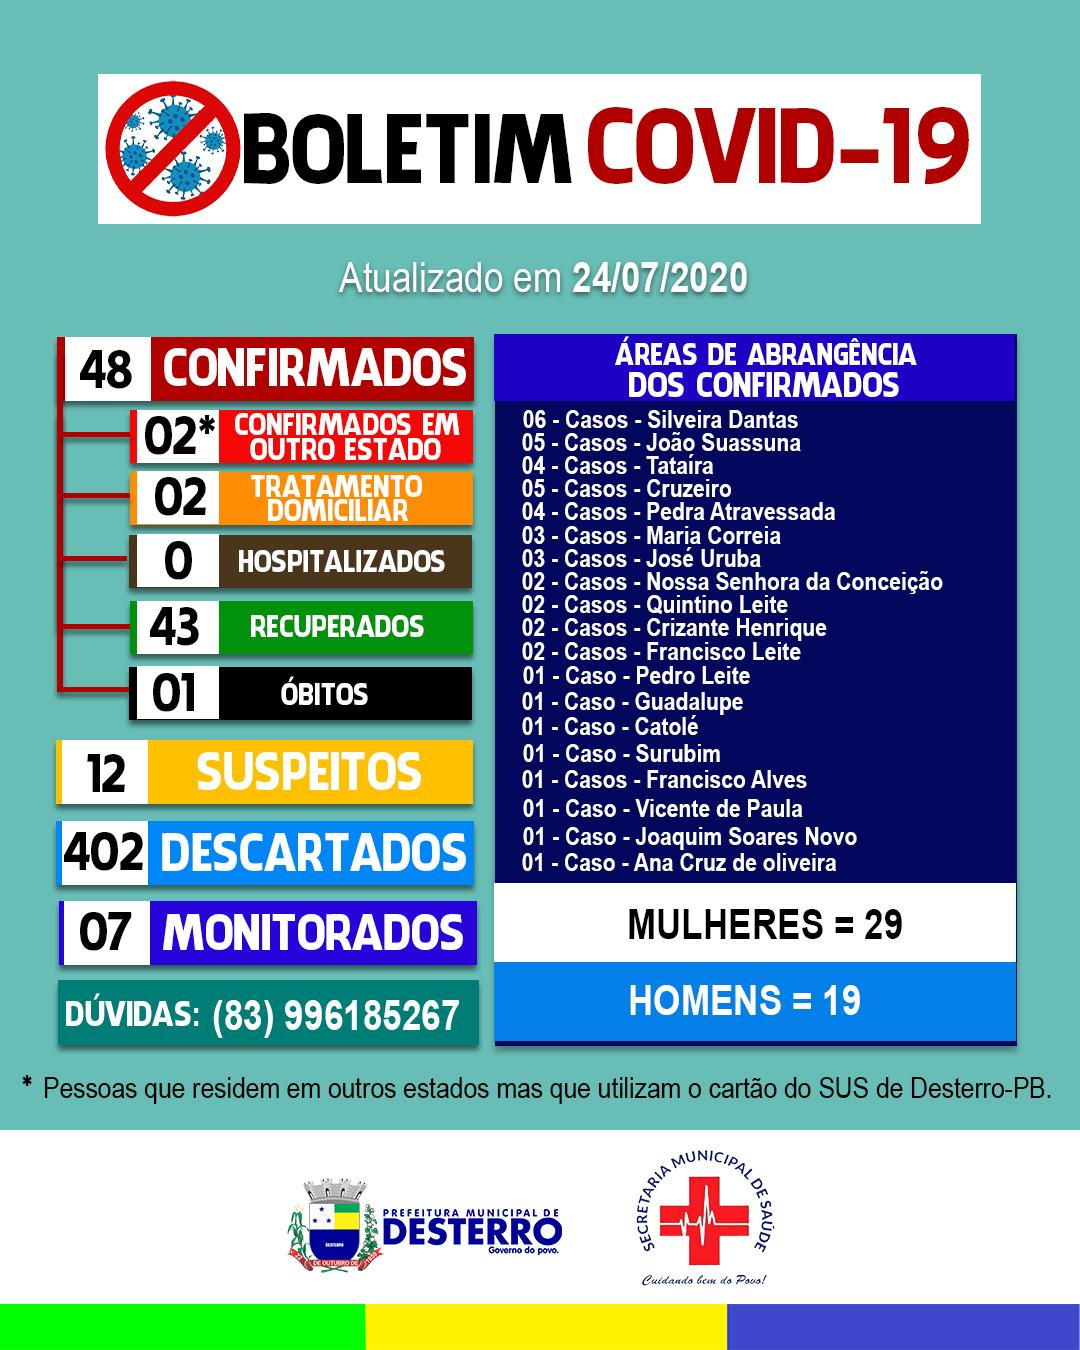 Boletim Covid-19 (24/07/2020)